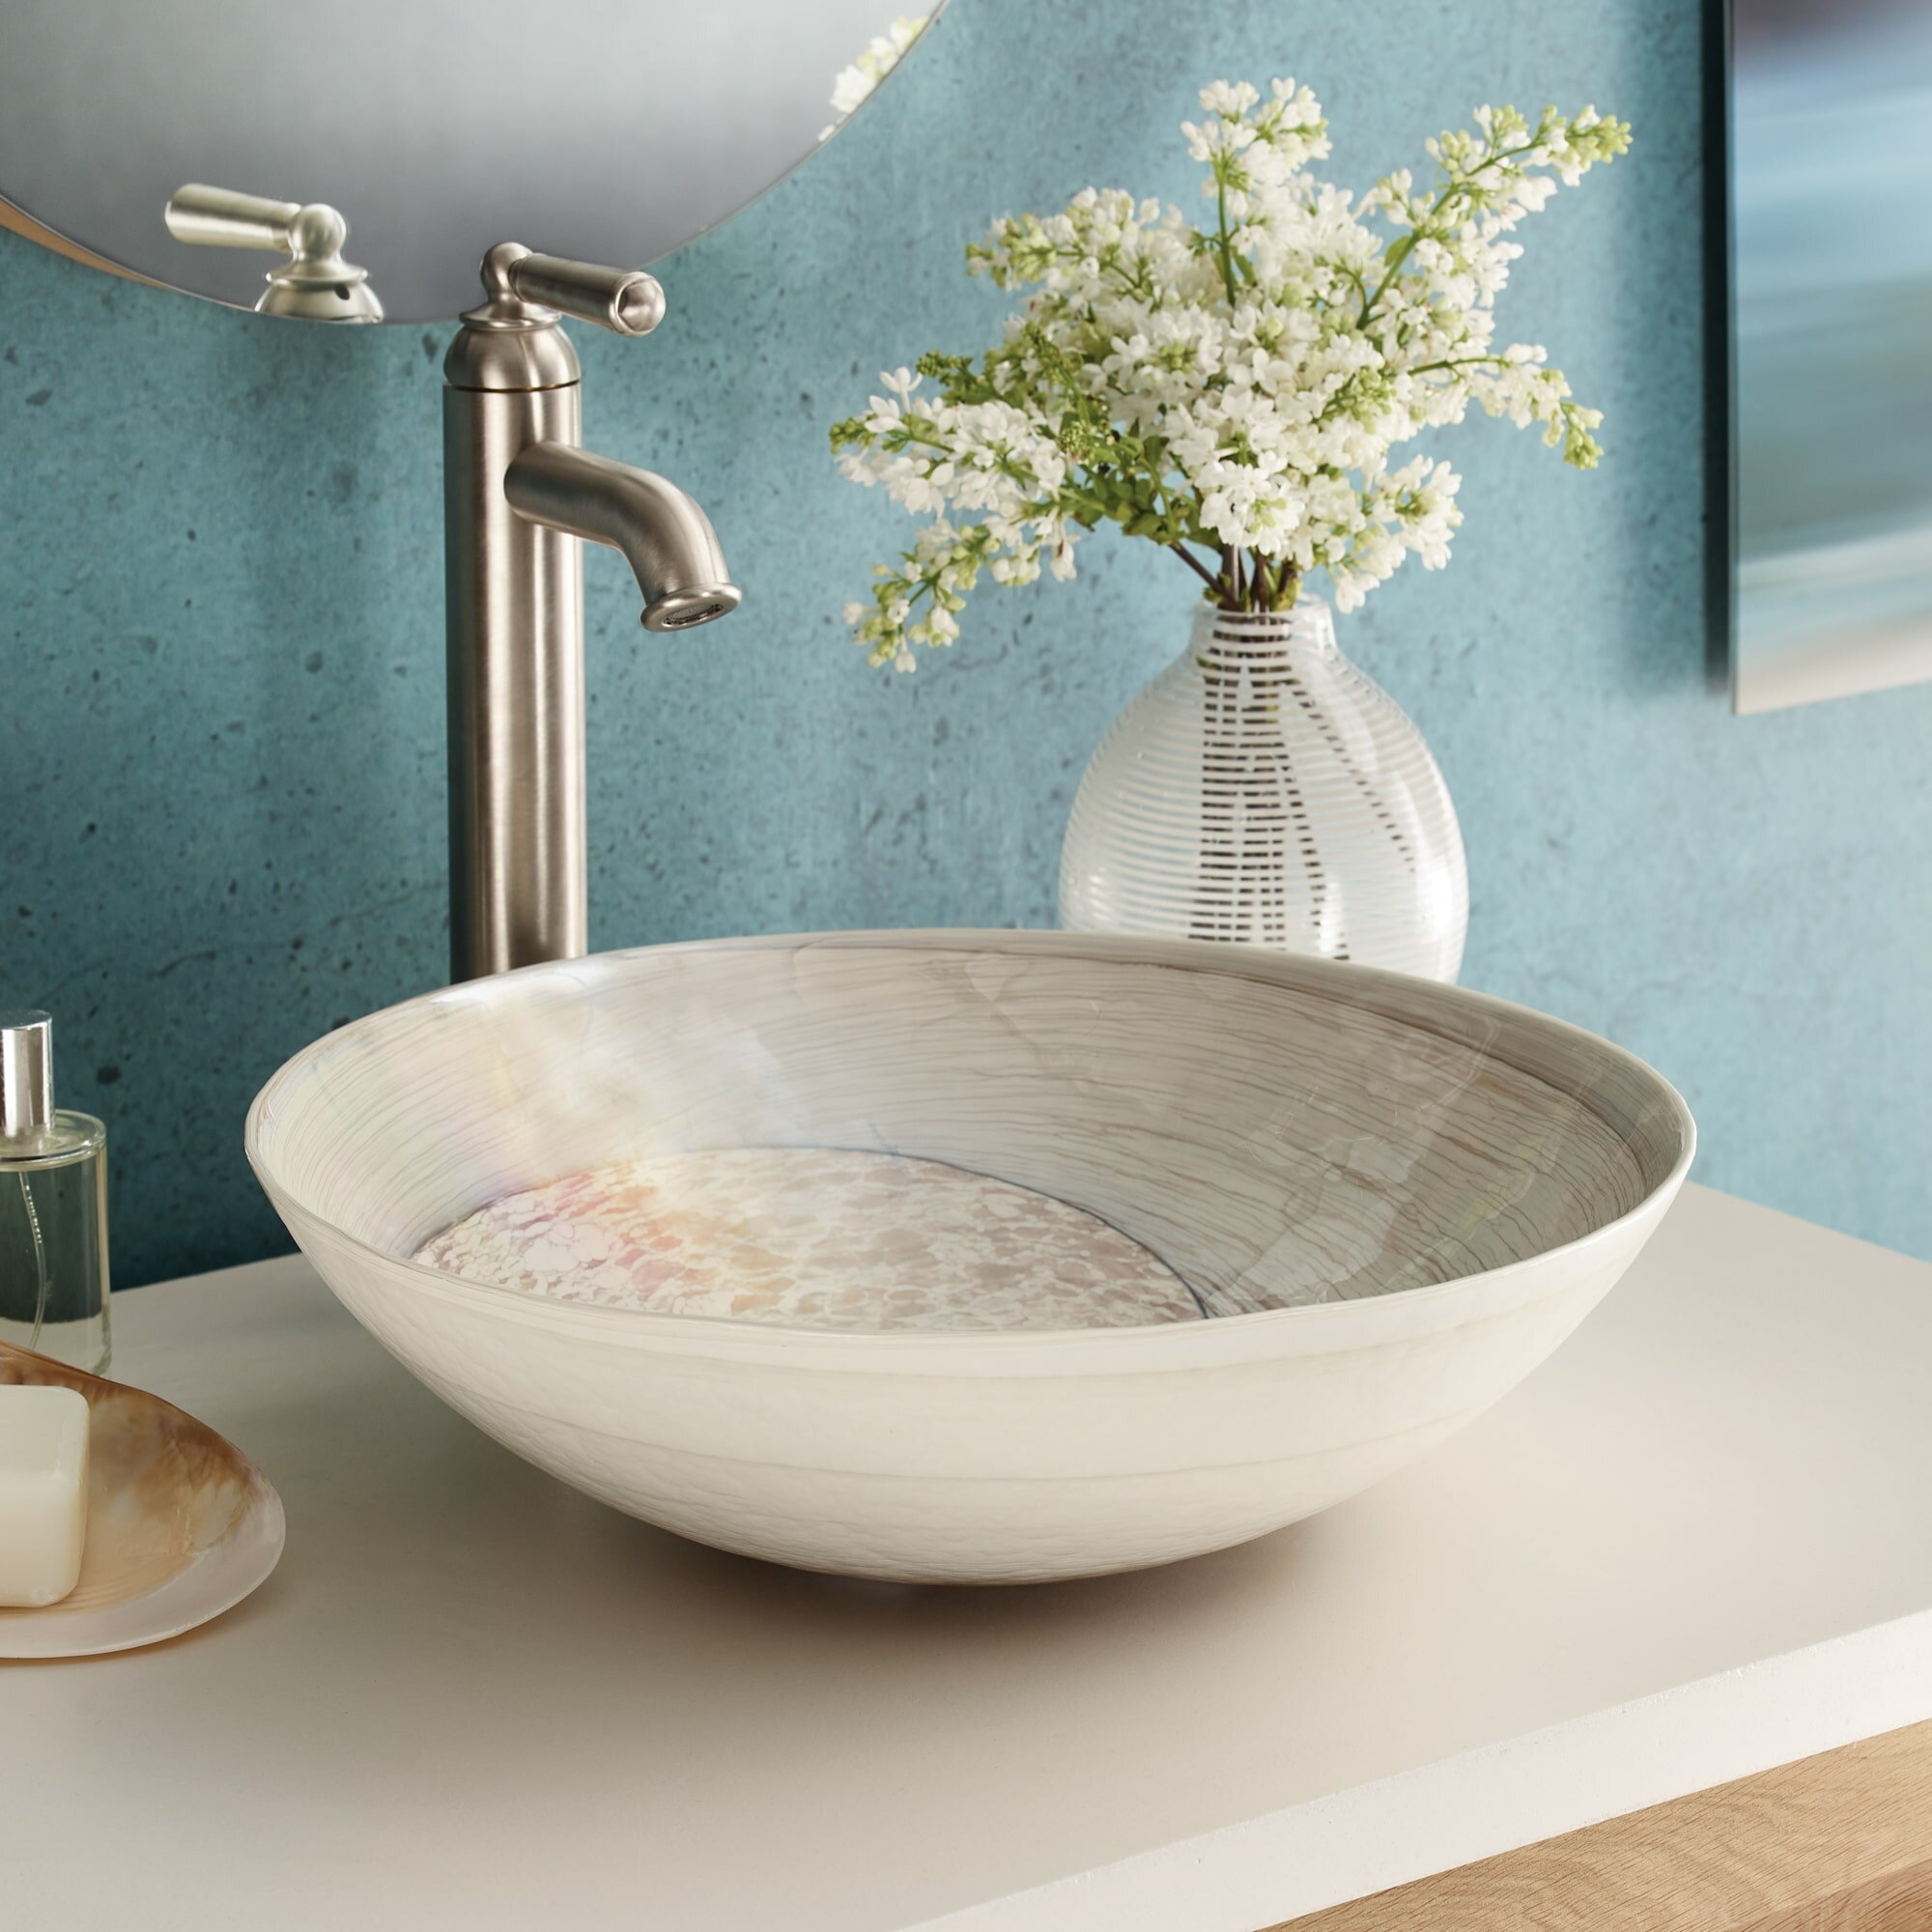 Native Trails Murano Glass Circular Vessel Bathroom Sink Wayfair